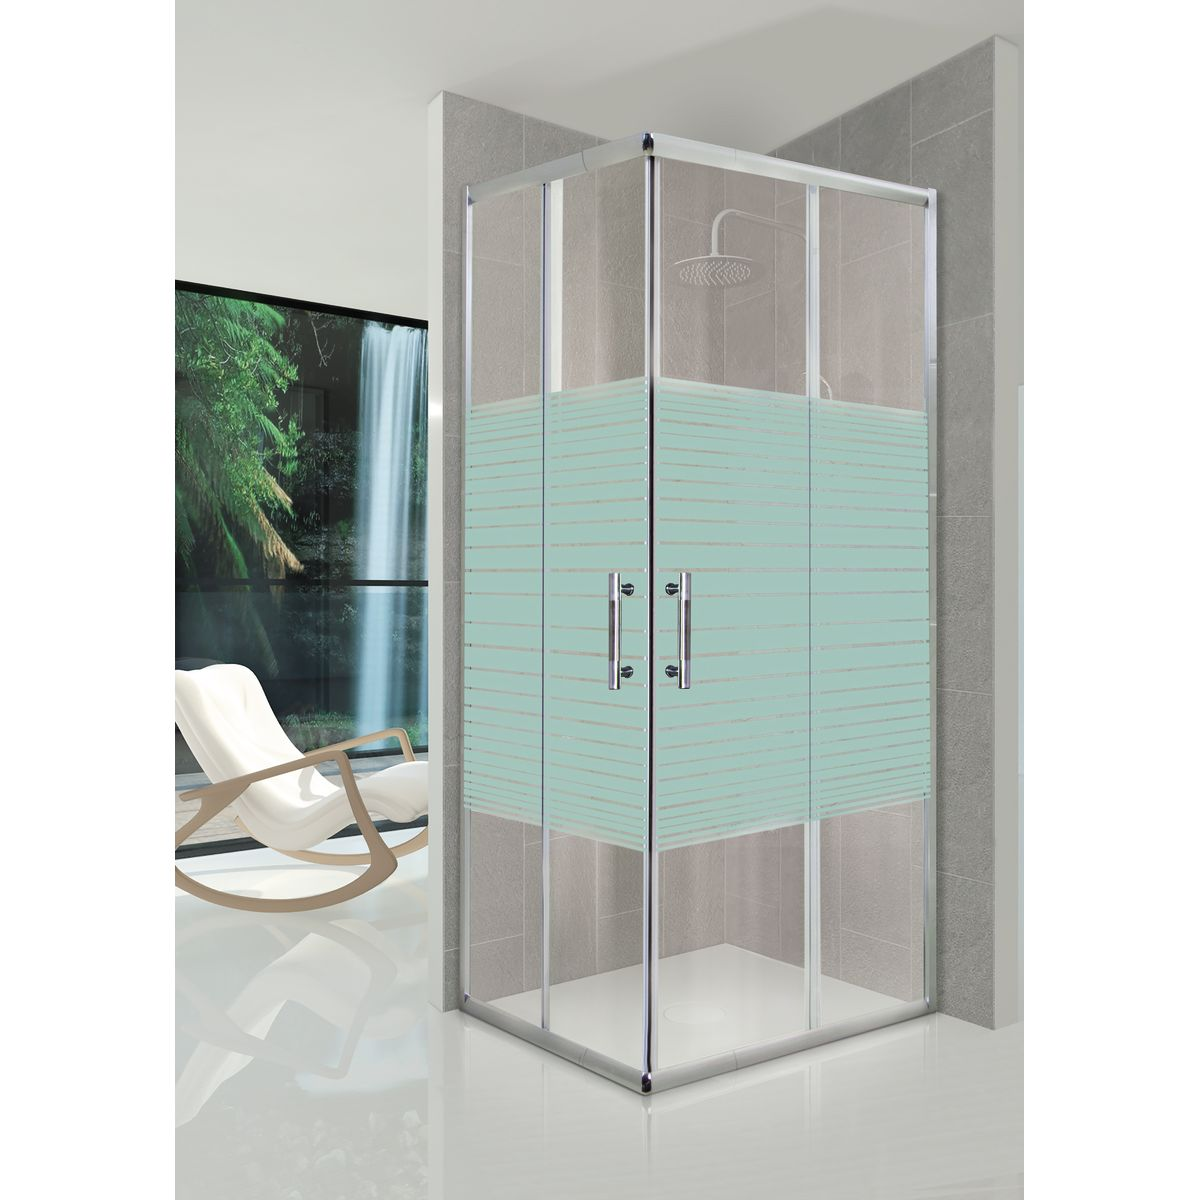 Tende a rullo per doccia latest top tenda doccia leroy for Offerte cabine doccia leroy merlin